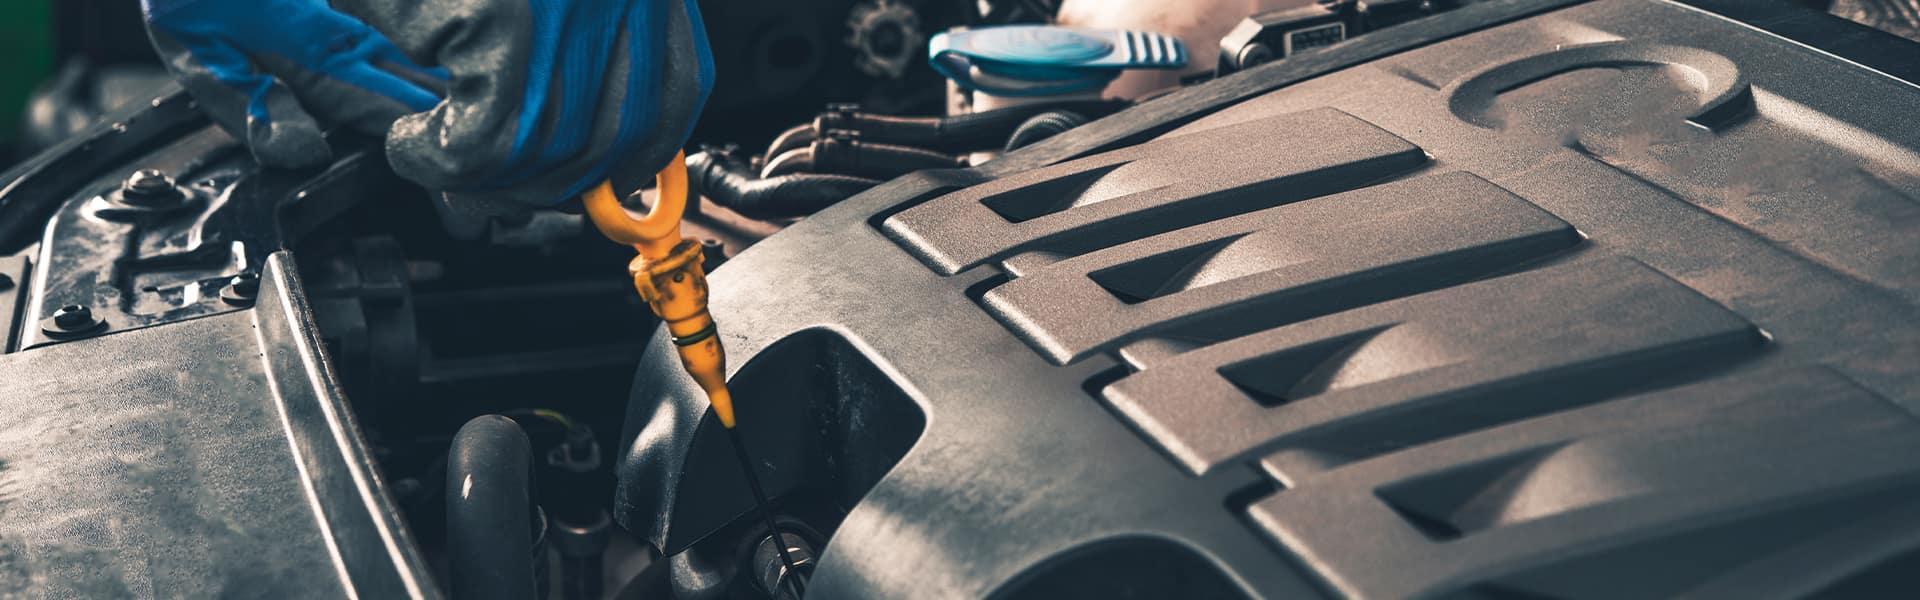 Benefits of Changing Your Honda's Oil at Washington Honda in Washington | Service Advisor Grabbing Oil Dip Stick From Engine